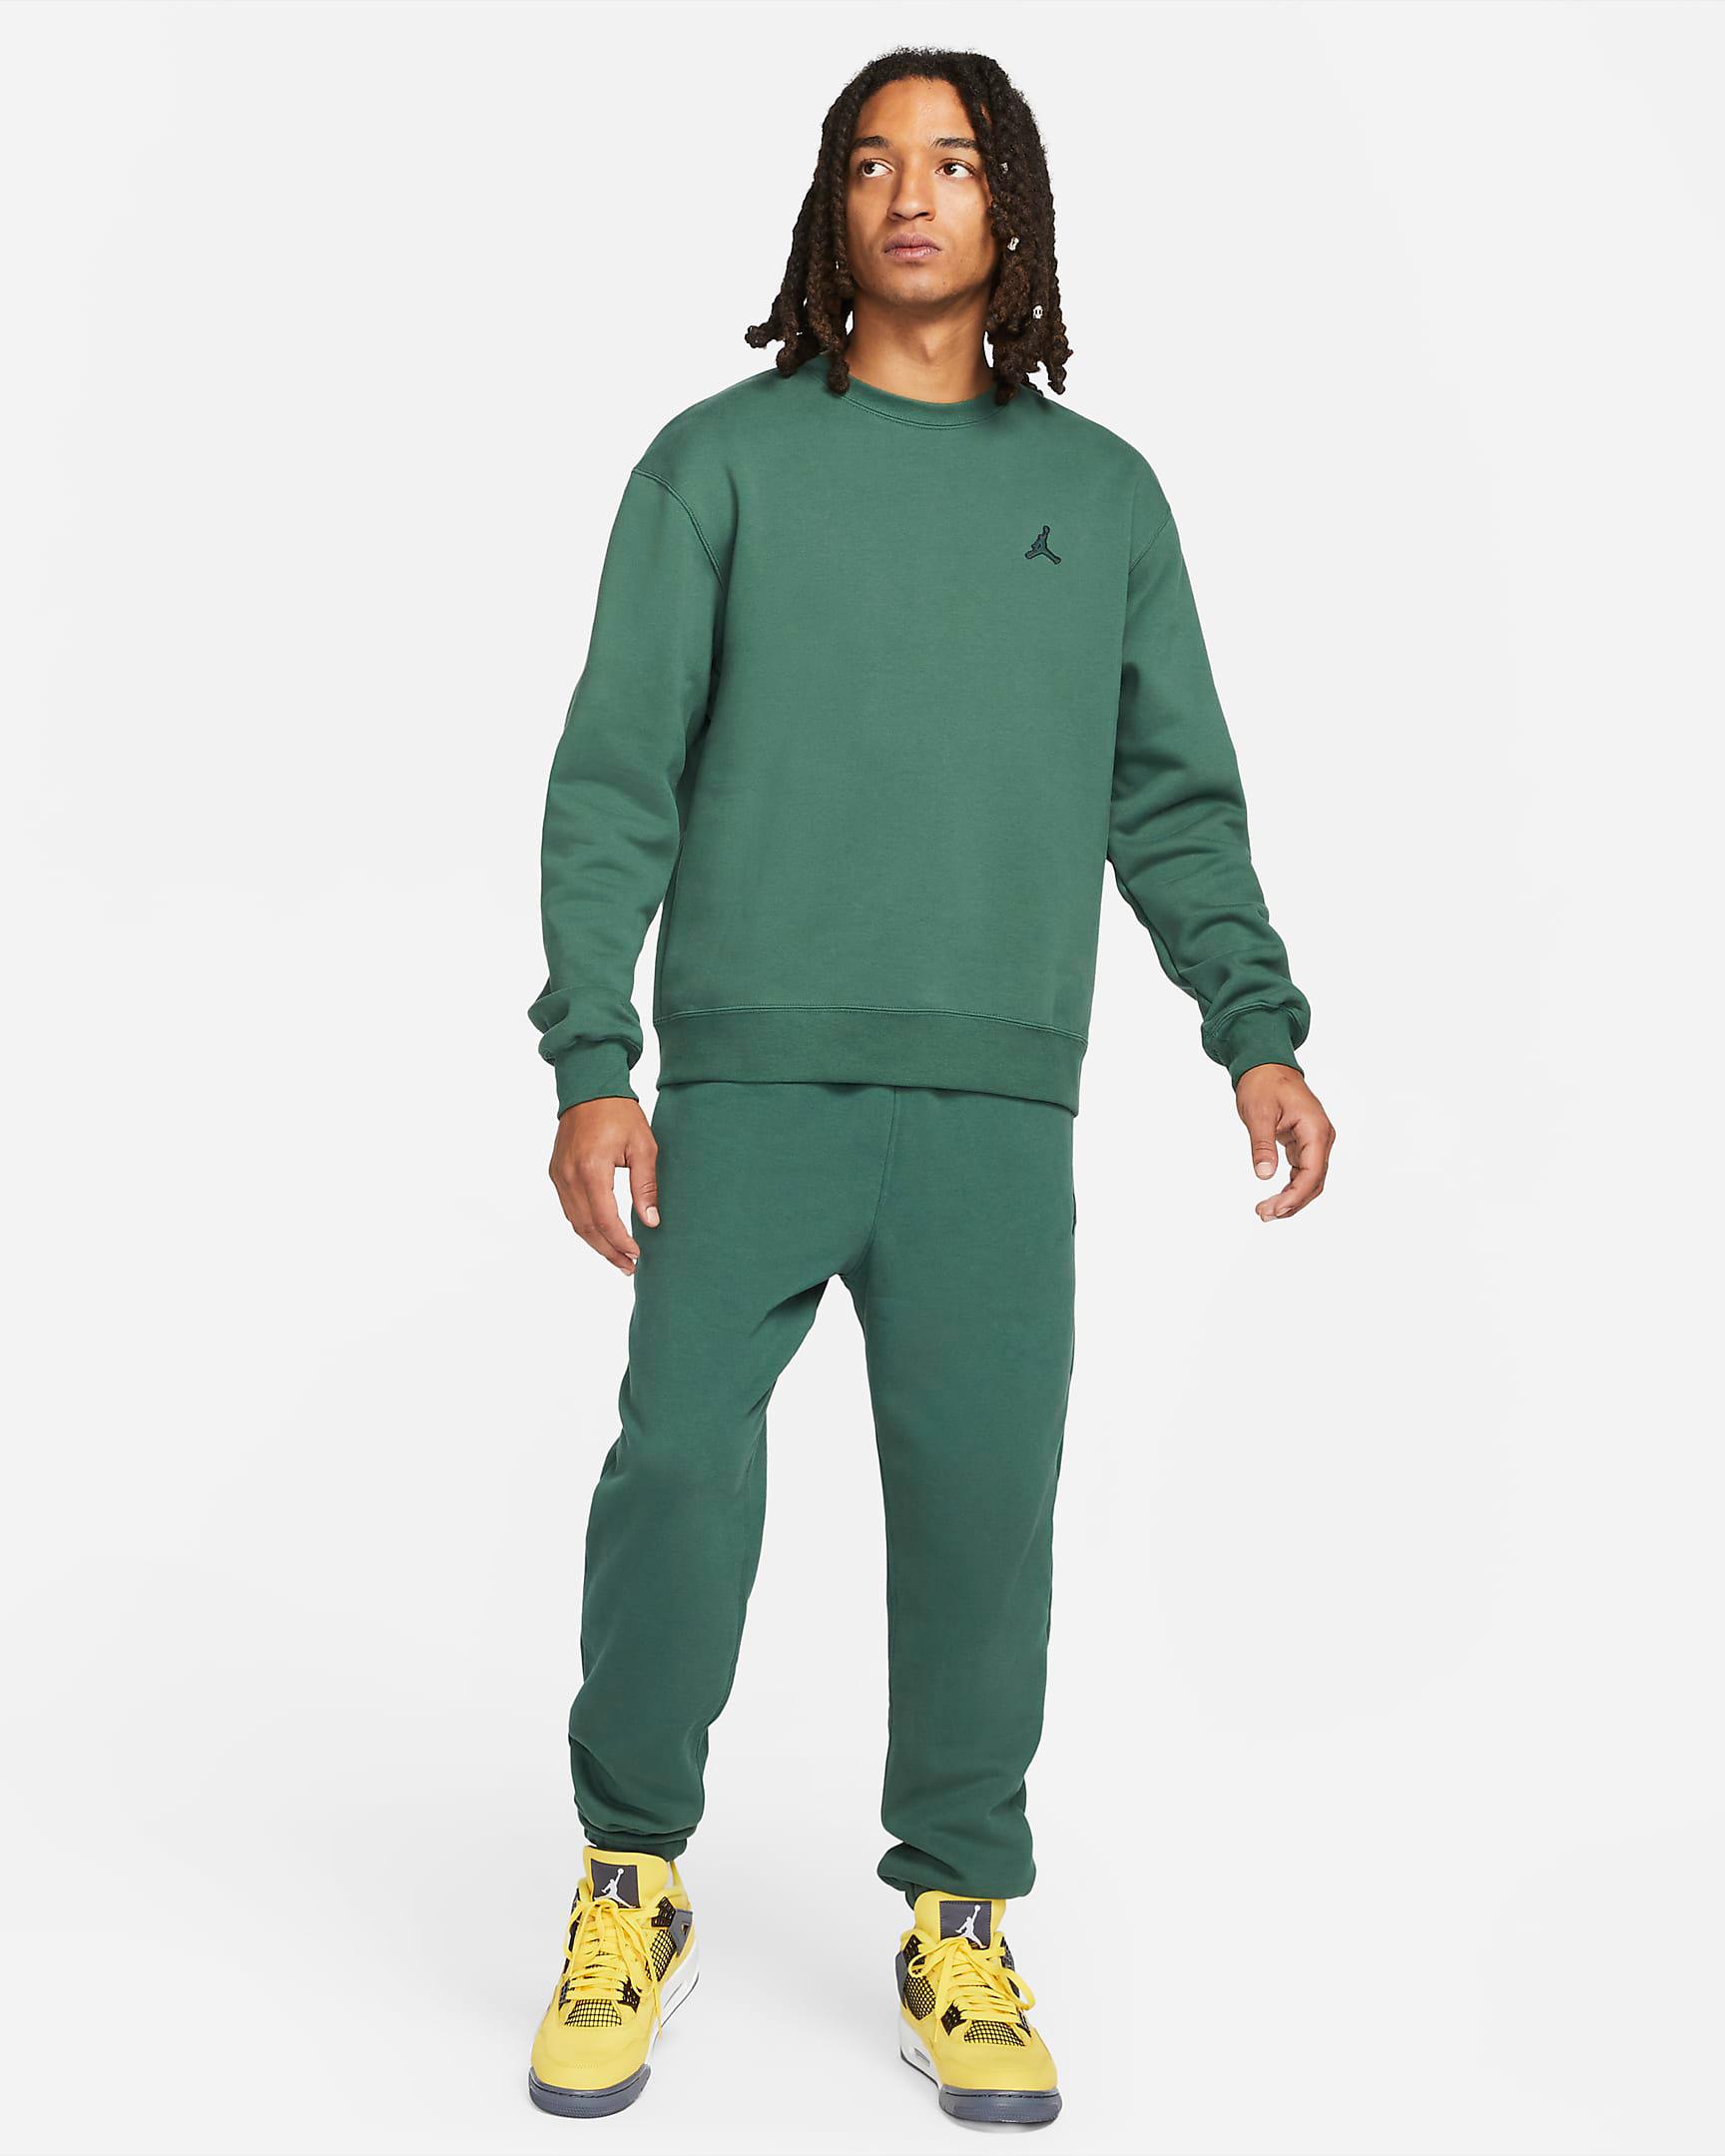 jordan-noble-green-statement-crew-sweatshirt-pants-outfit